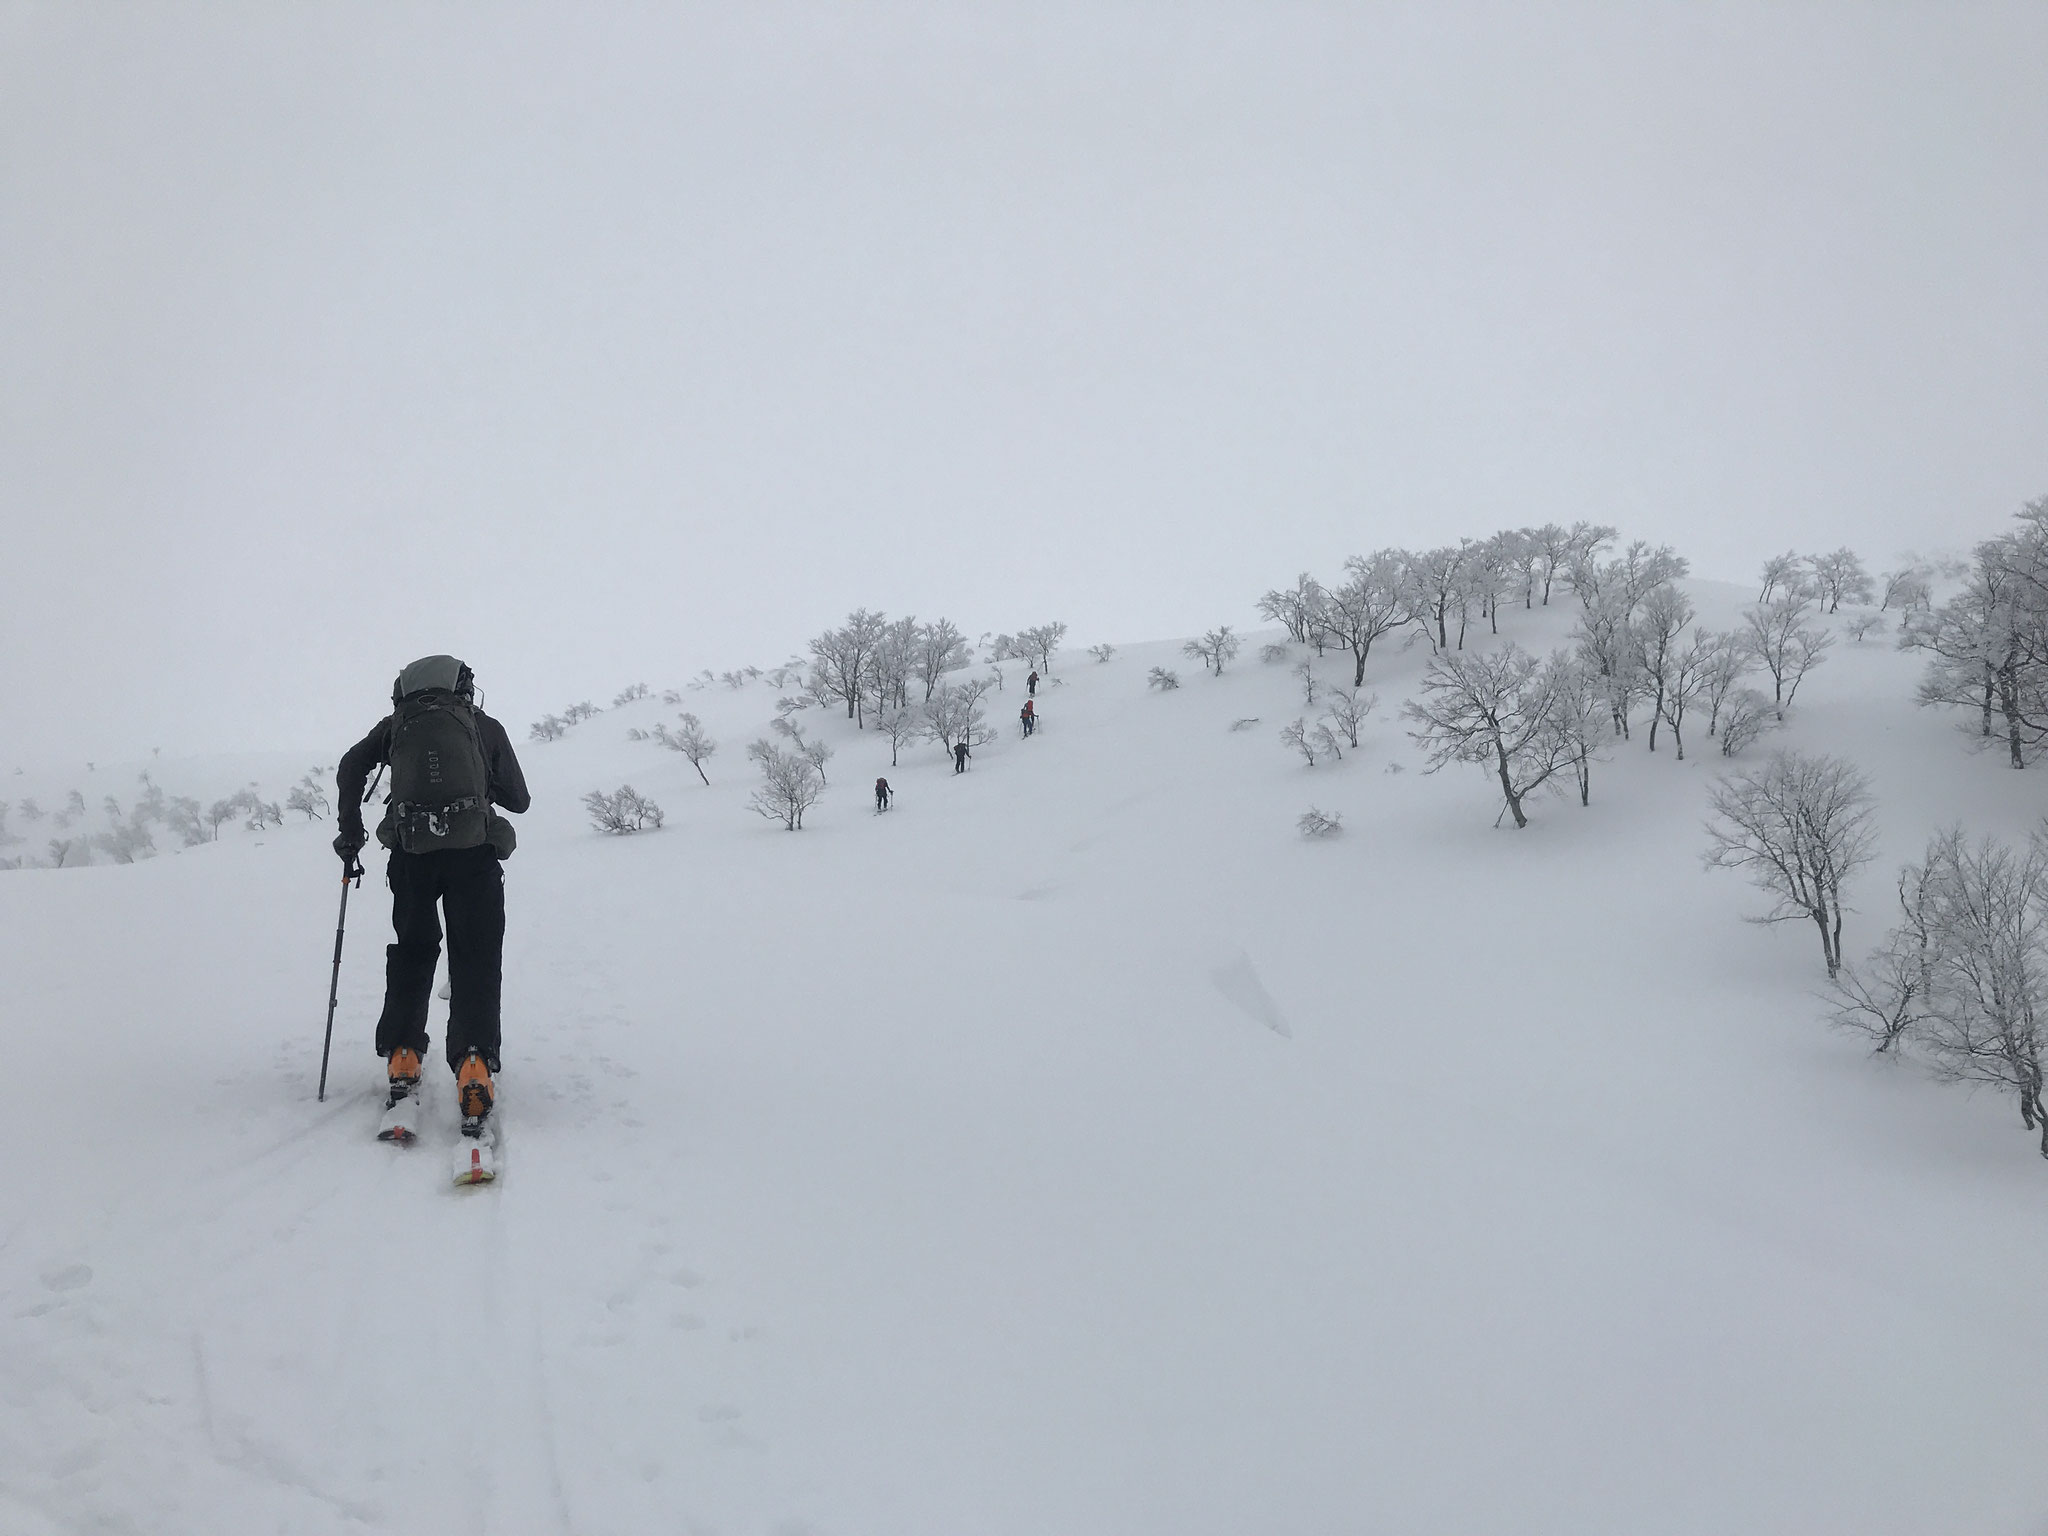 上部は新雪